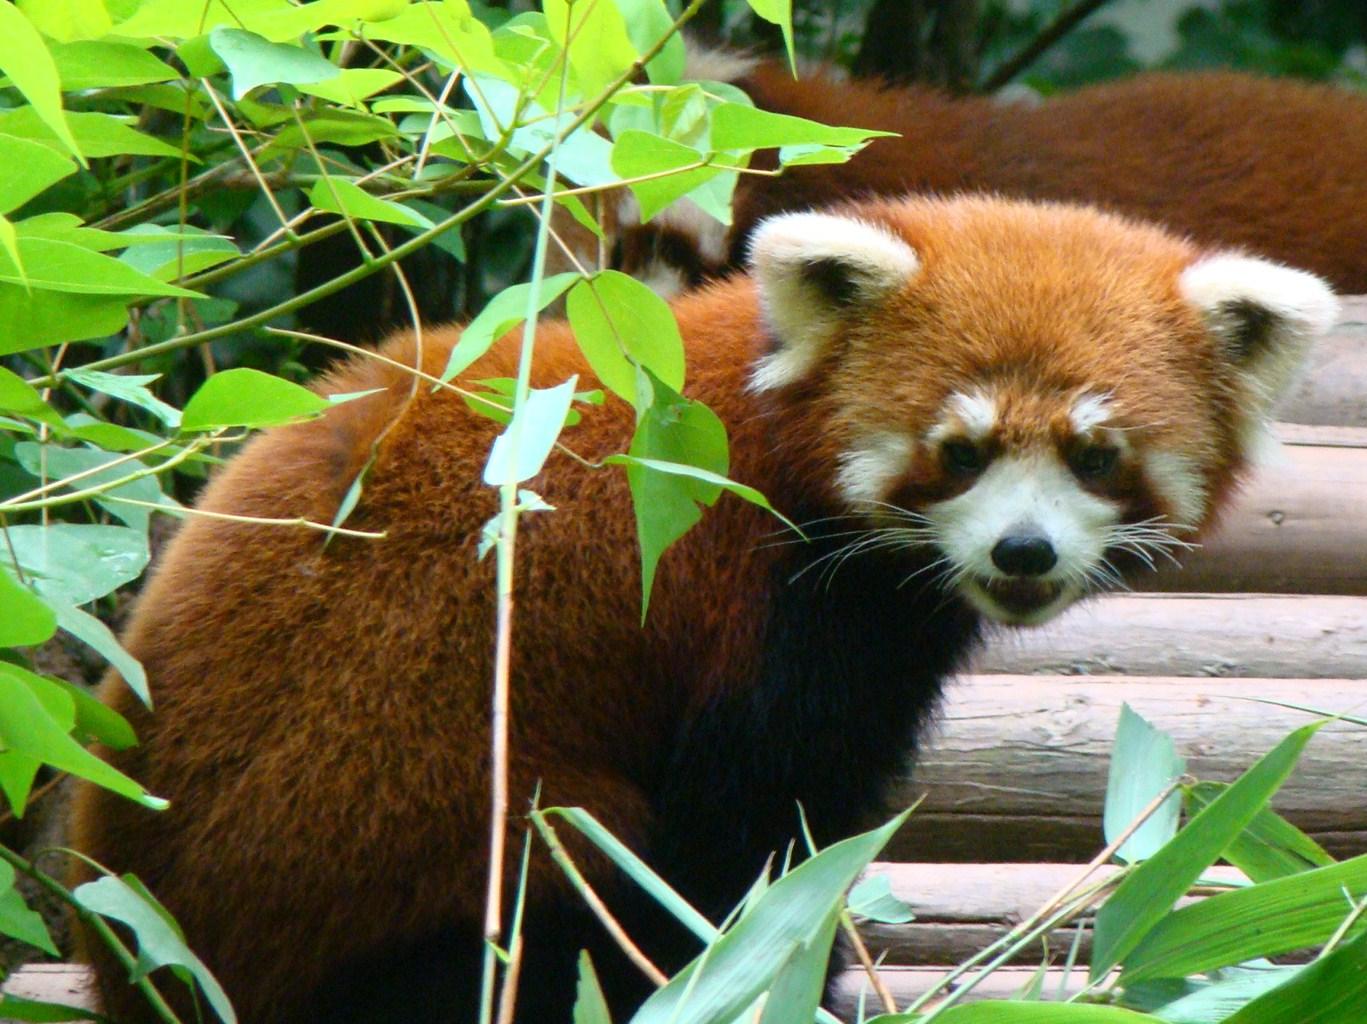 Up close with Giant Pandas